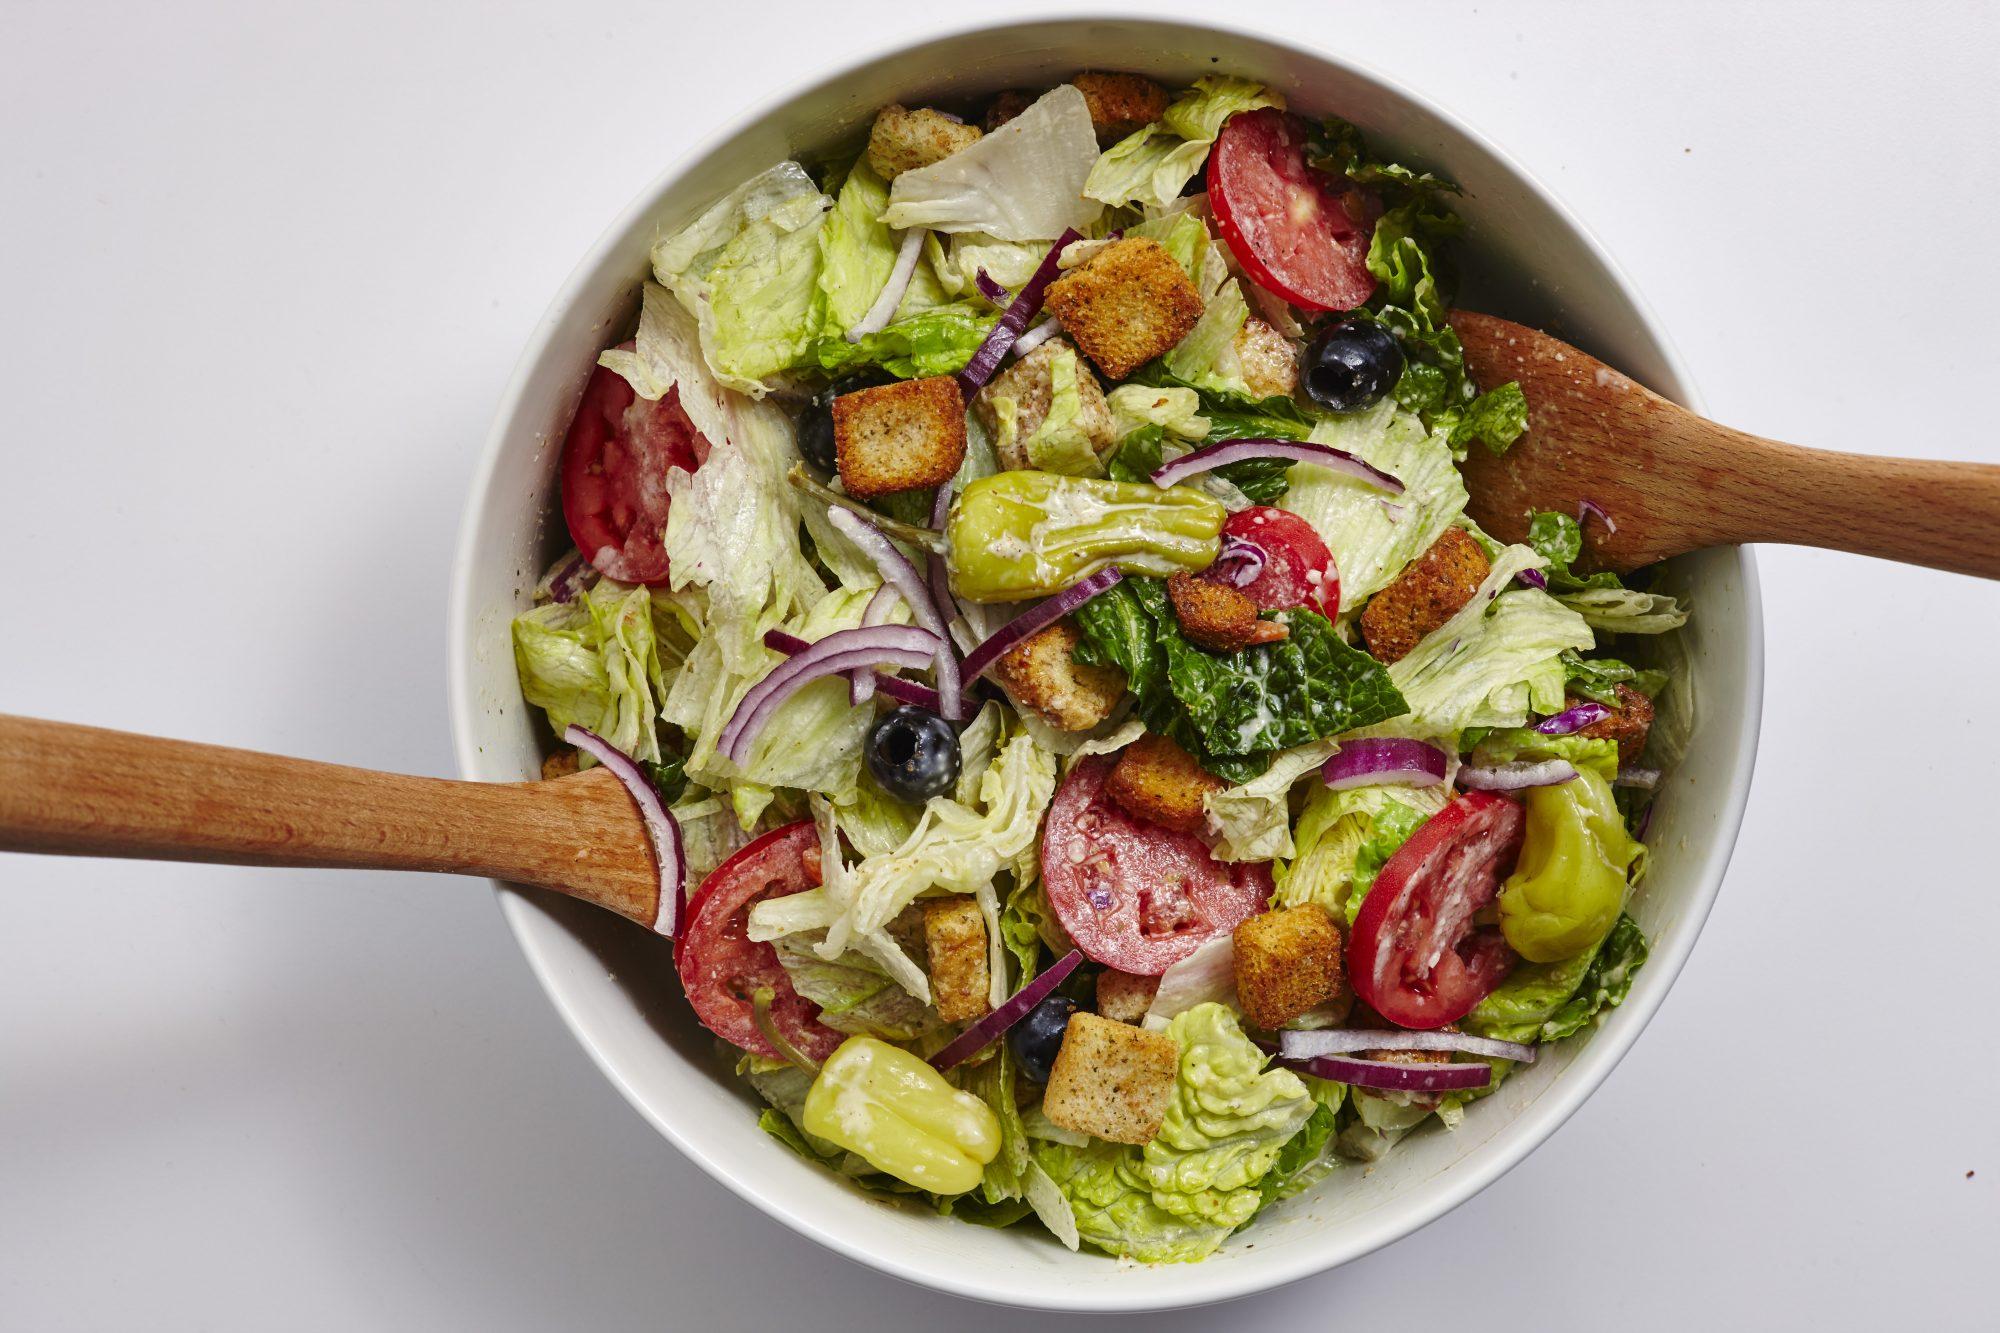 Copycat Olive Garden Salad image